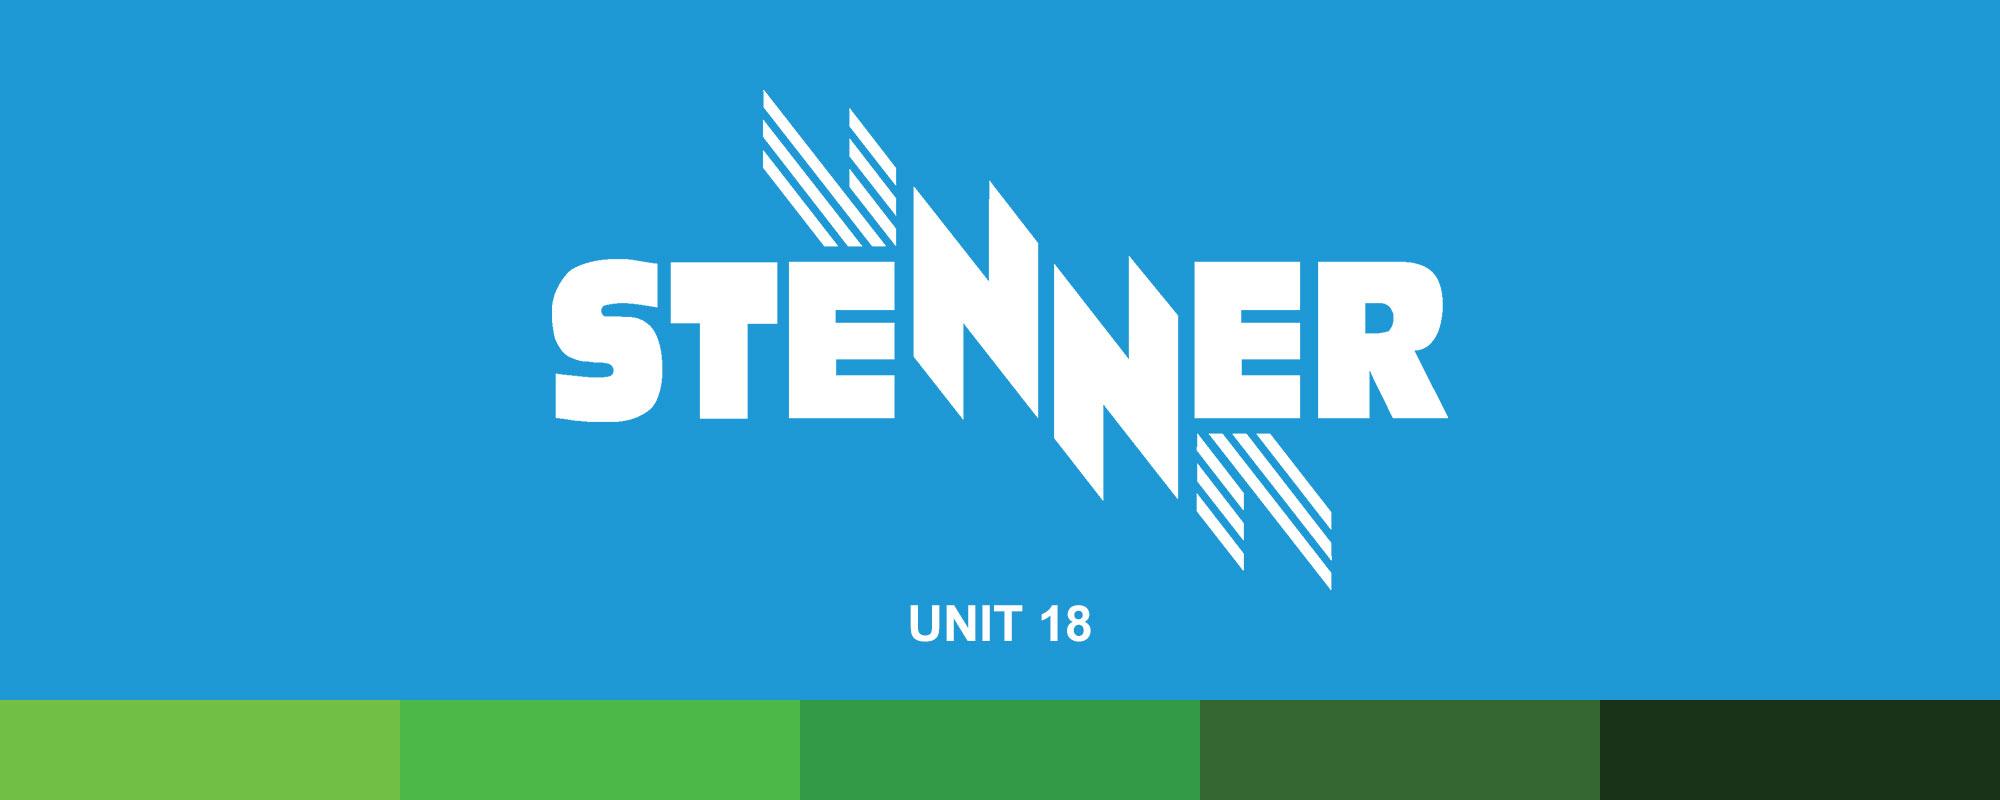 Stenner Ltd